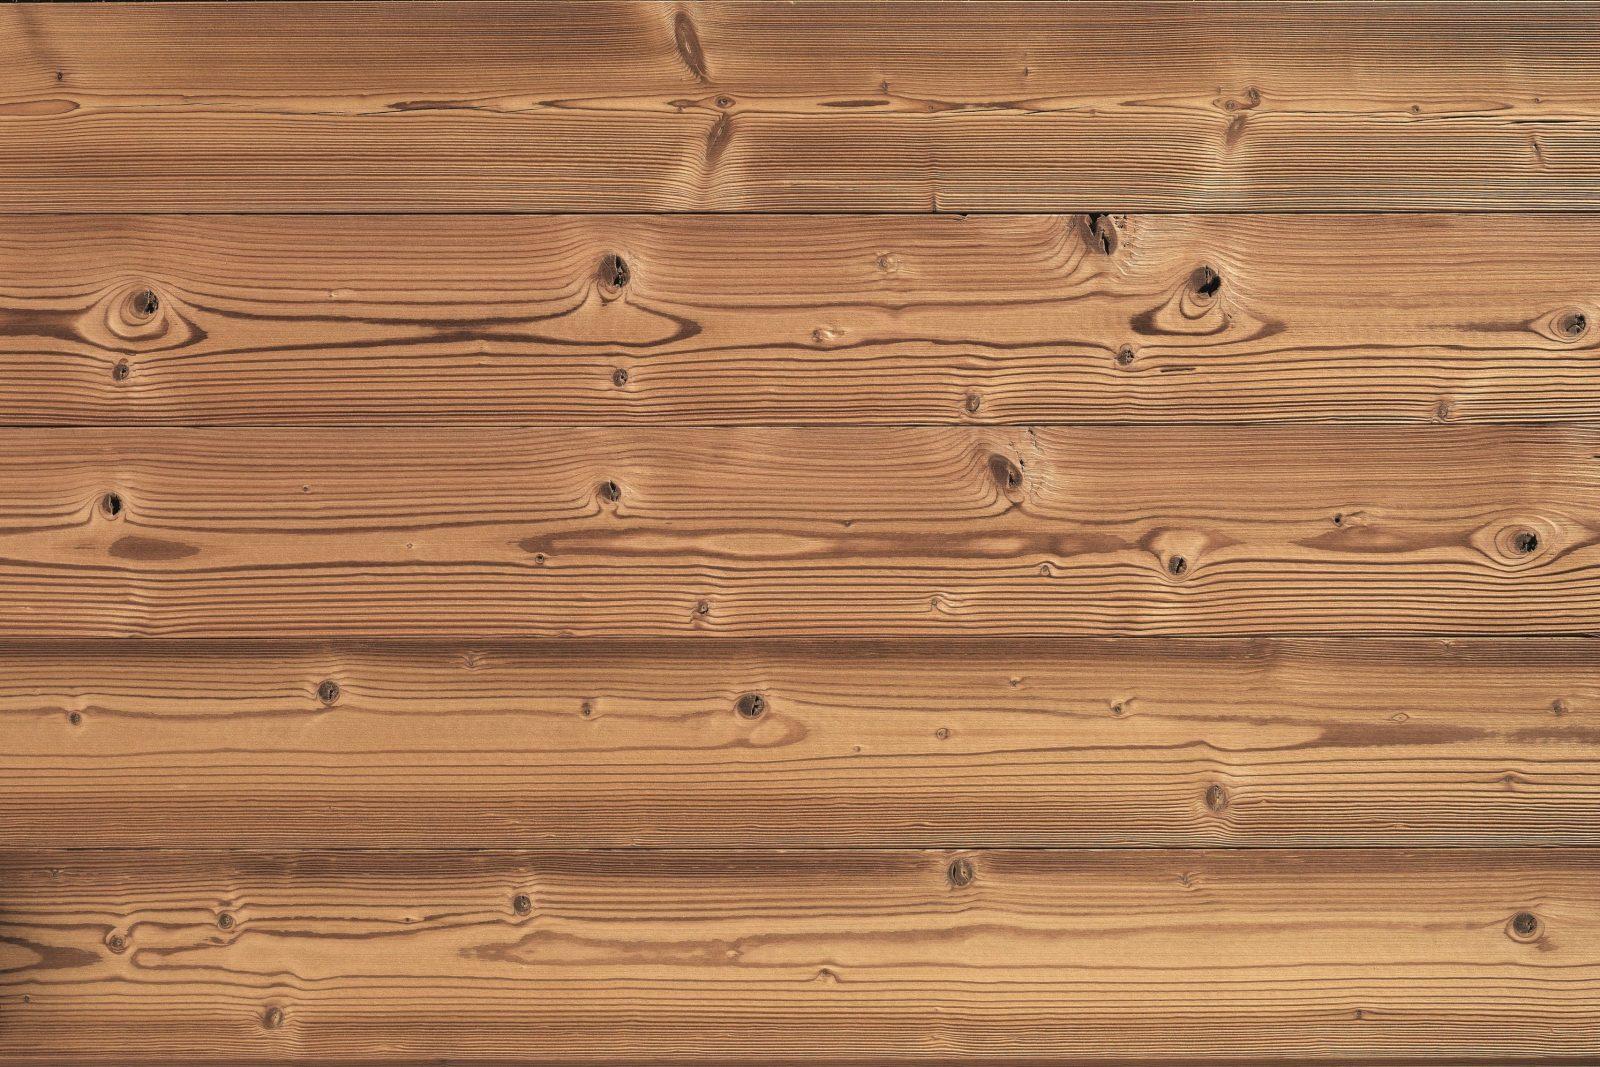 Strikingly Beautiful Wandverkleidung Holz Innen Rustikal – Melian Ie von Wandverkleidung Holz Innen Rustikal Bild